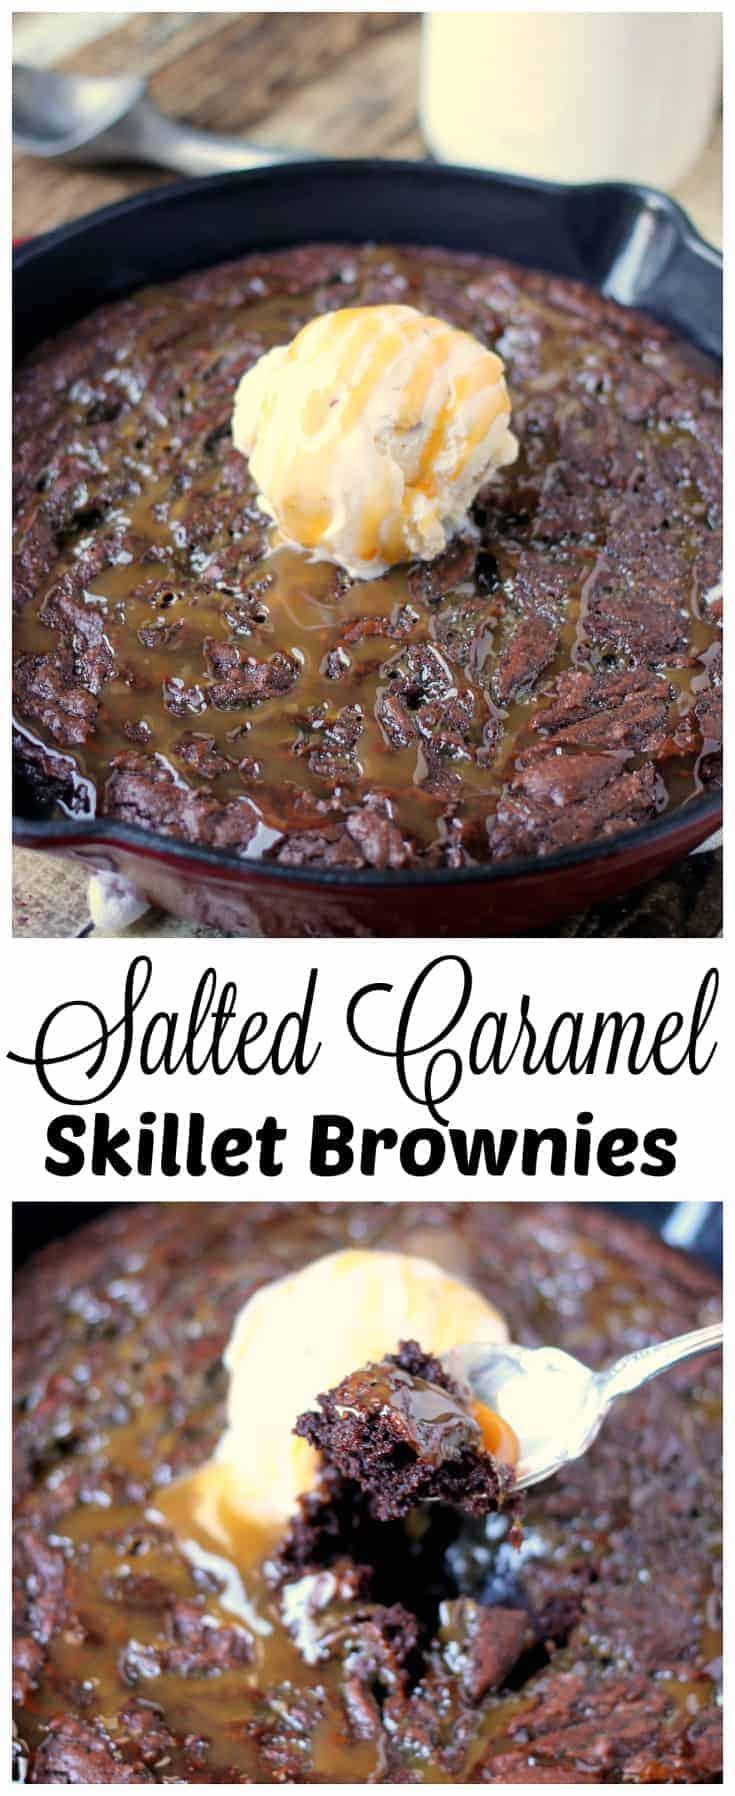 Salted Caramel Skillet Brownies Recipe